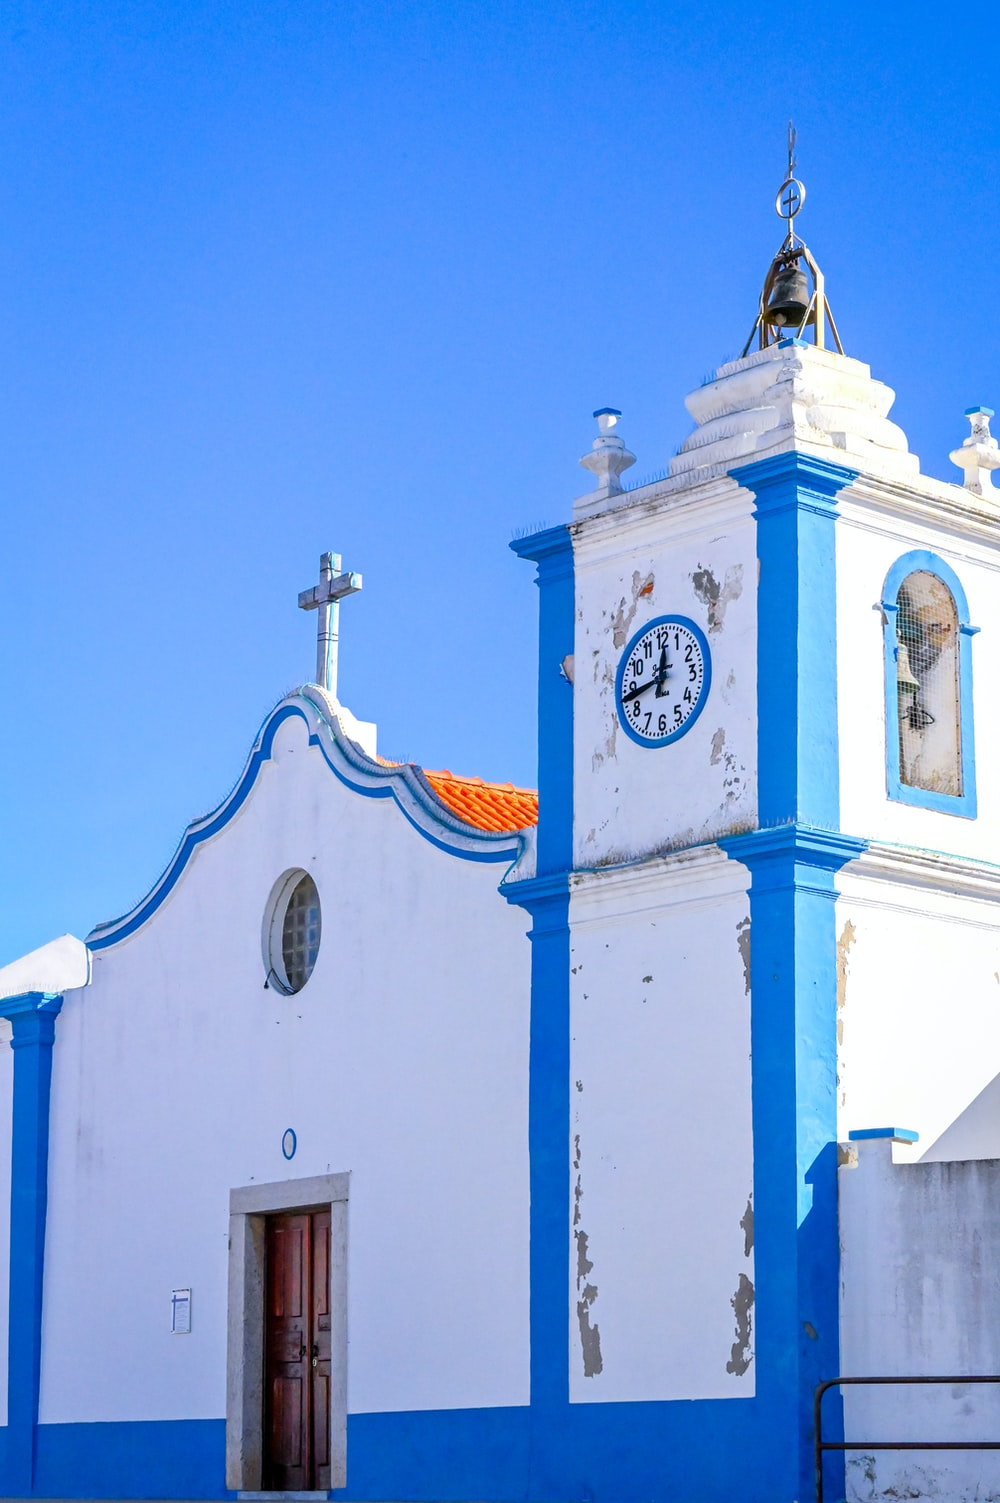 white and blue concrete church